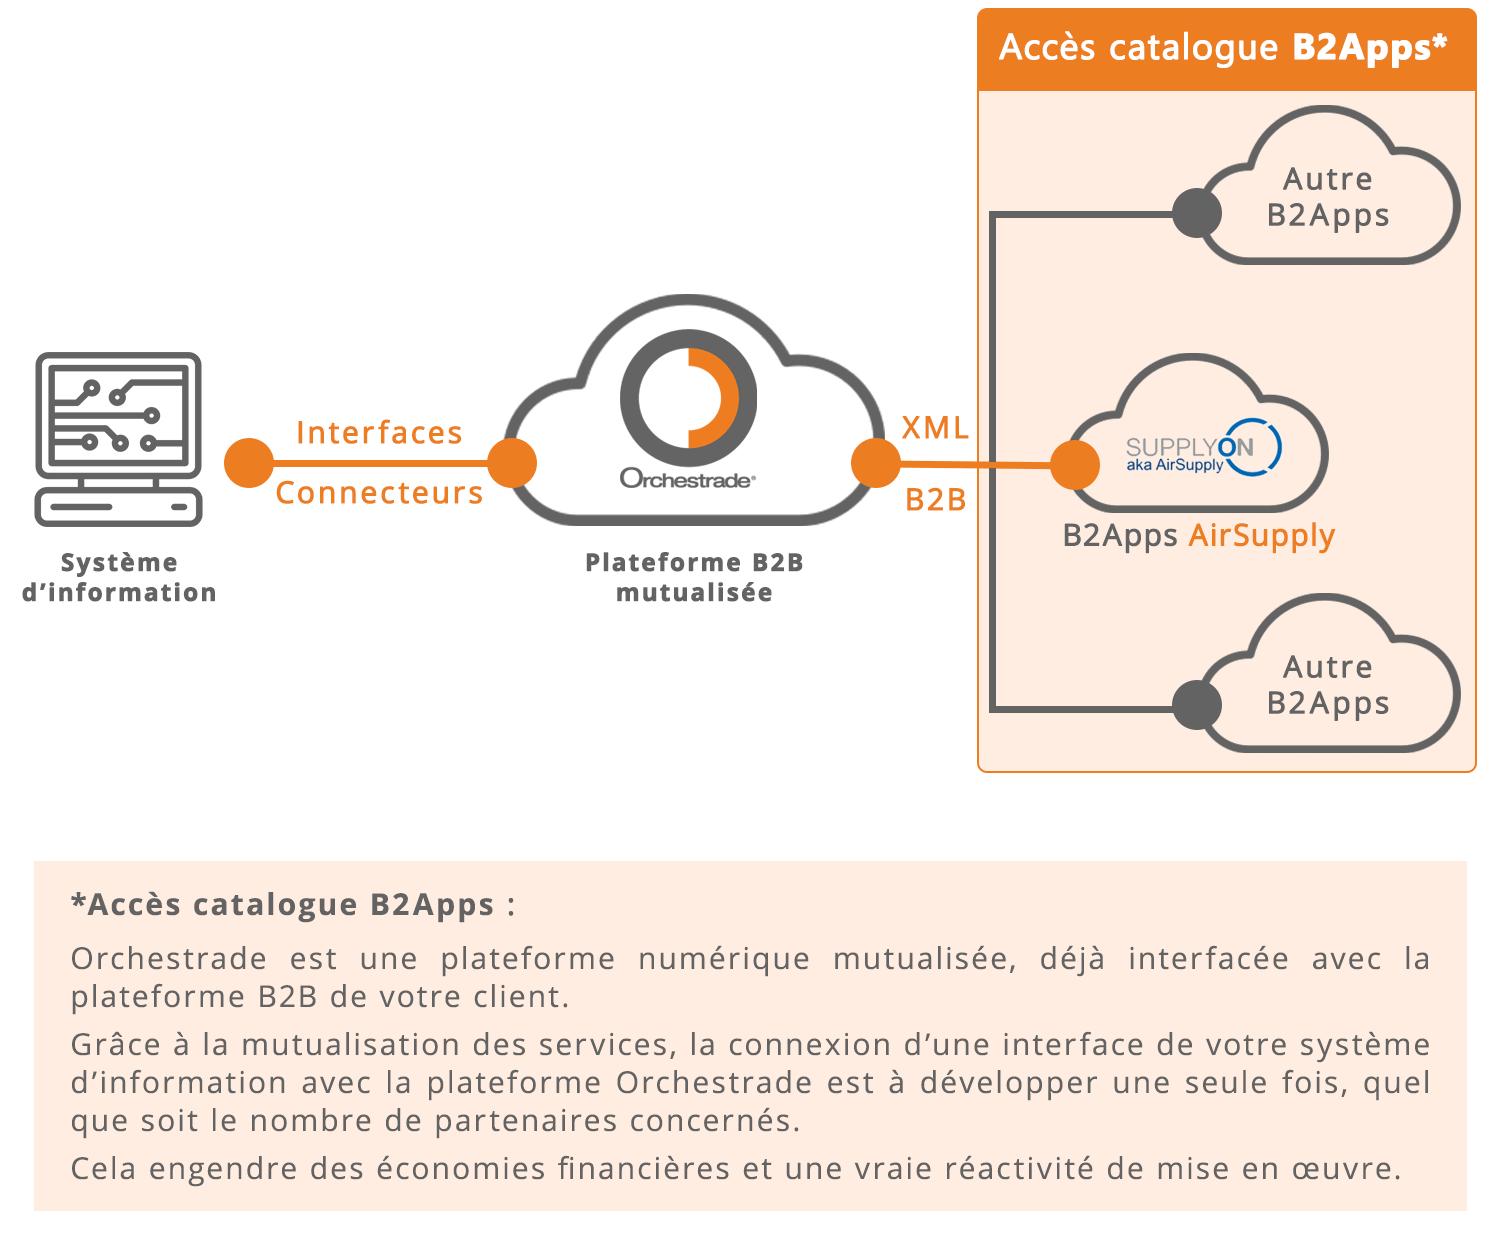 Connexion XML avec la plateforme AirSupply